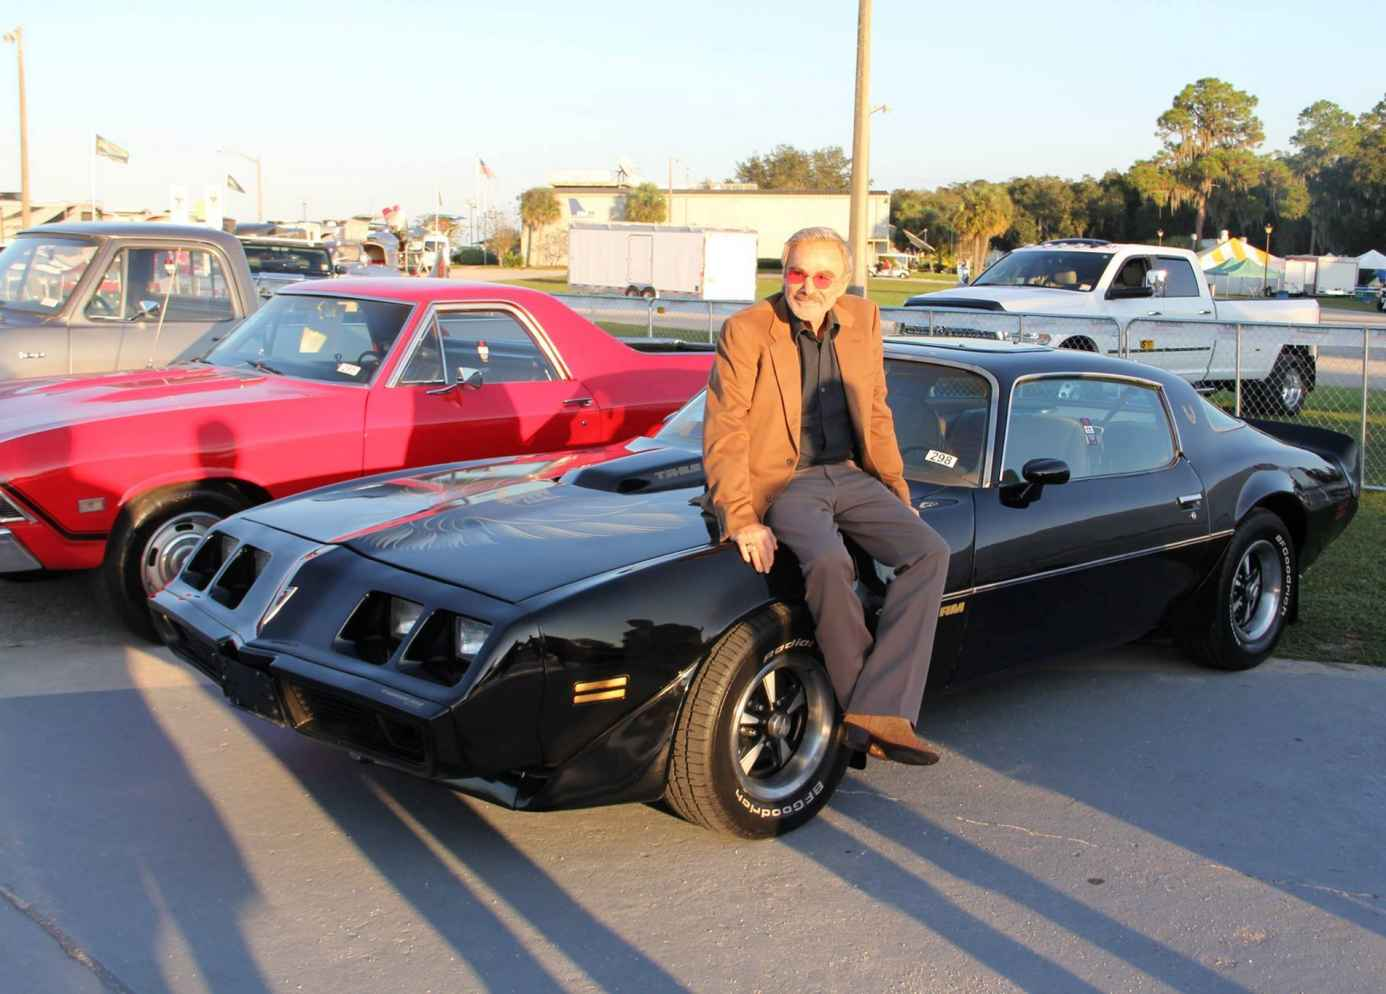 Car Auction Websites >> The Bandit Steals the Show at Fall Florida AutoFest -- Michael E Garland Jr | PRLog